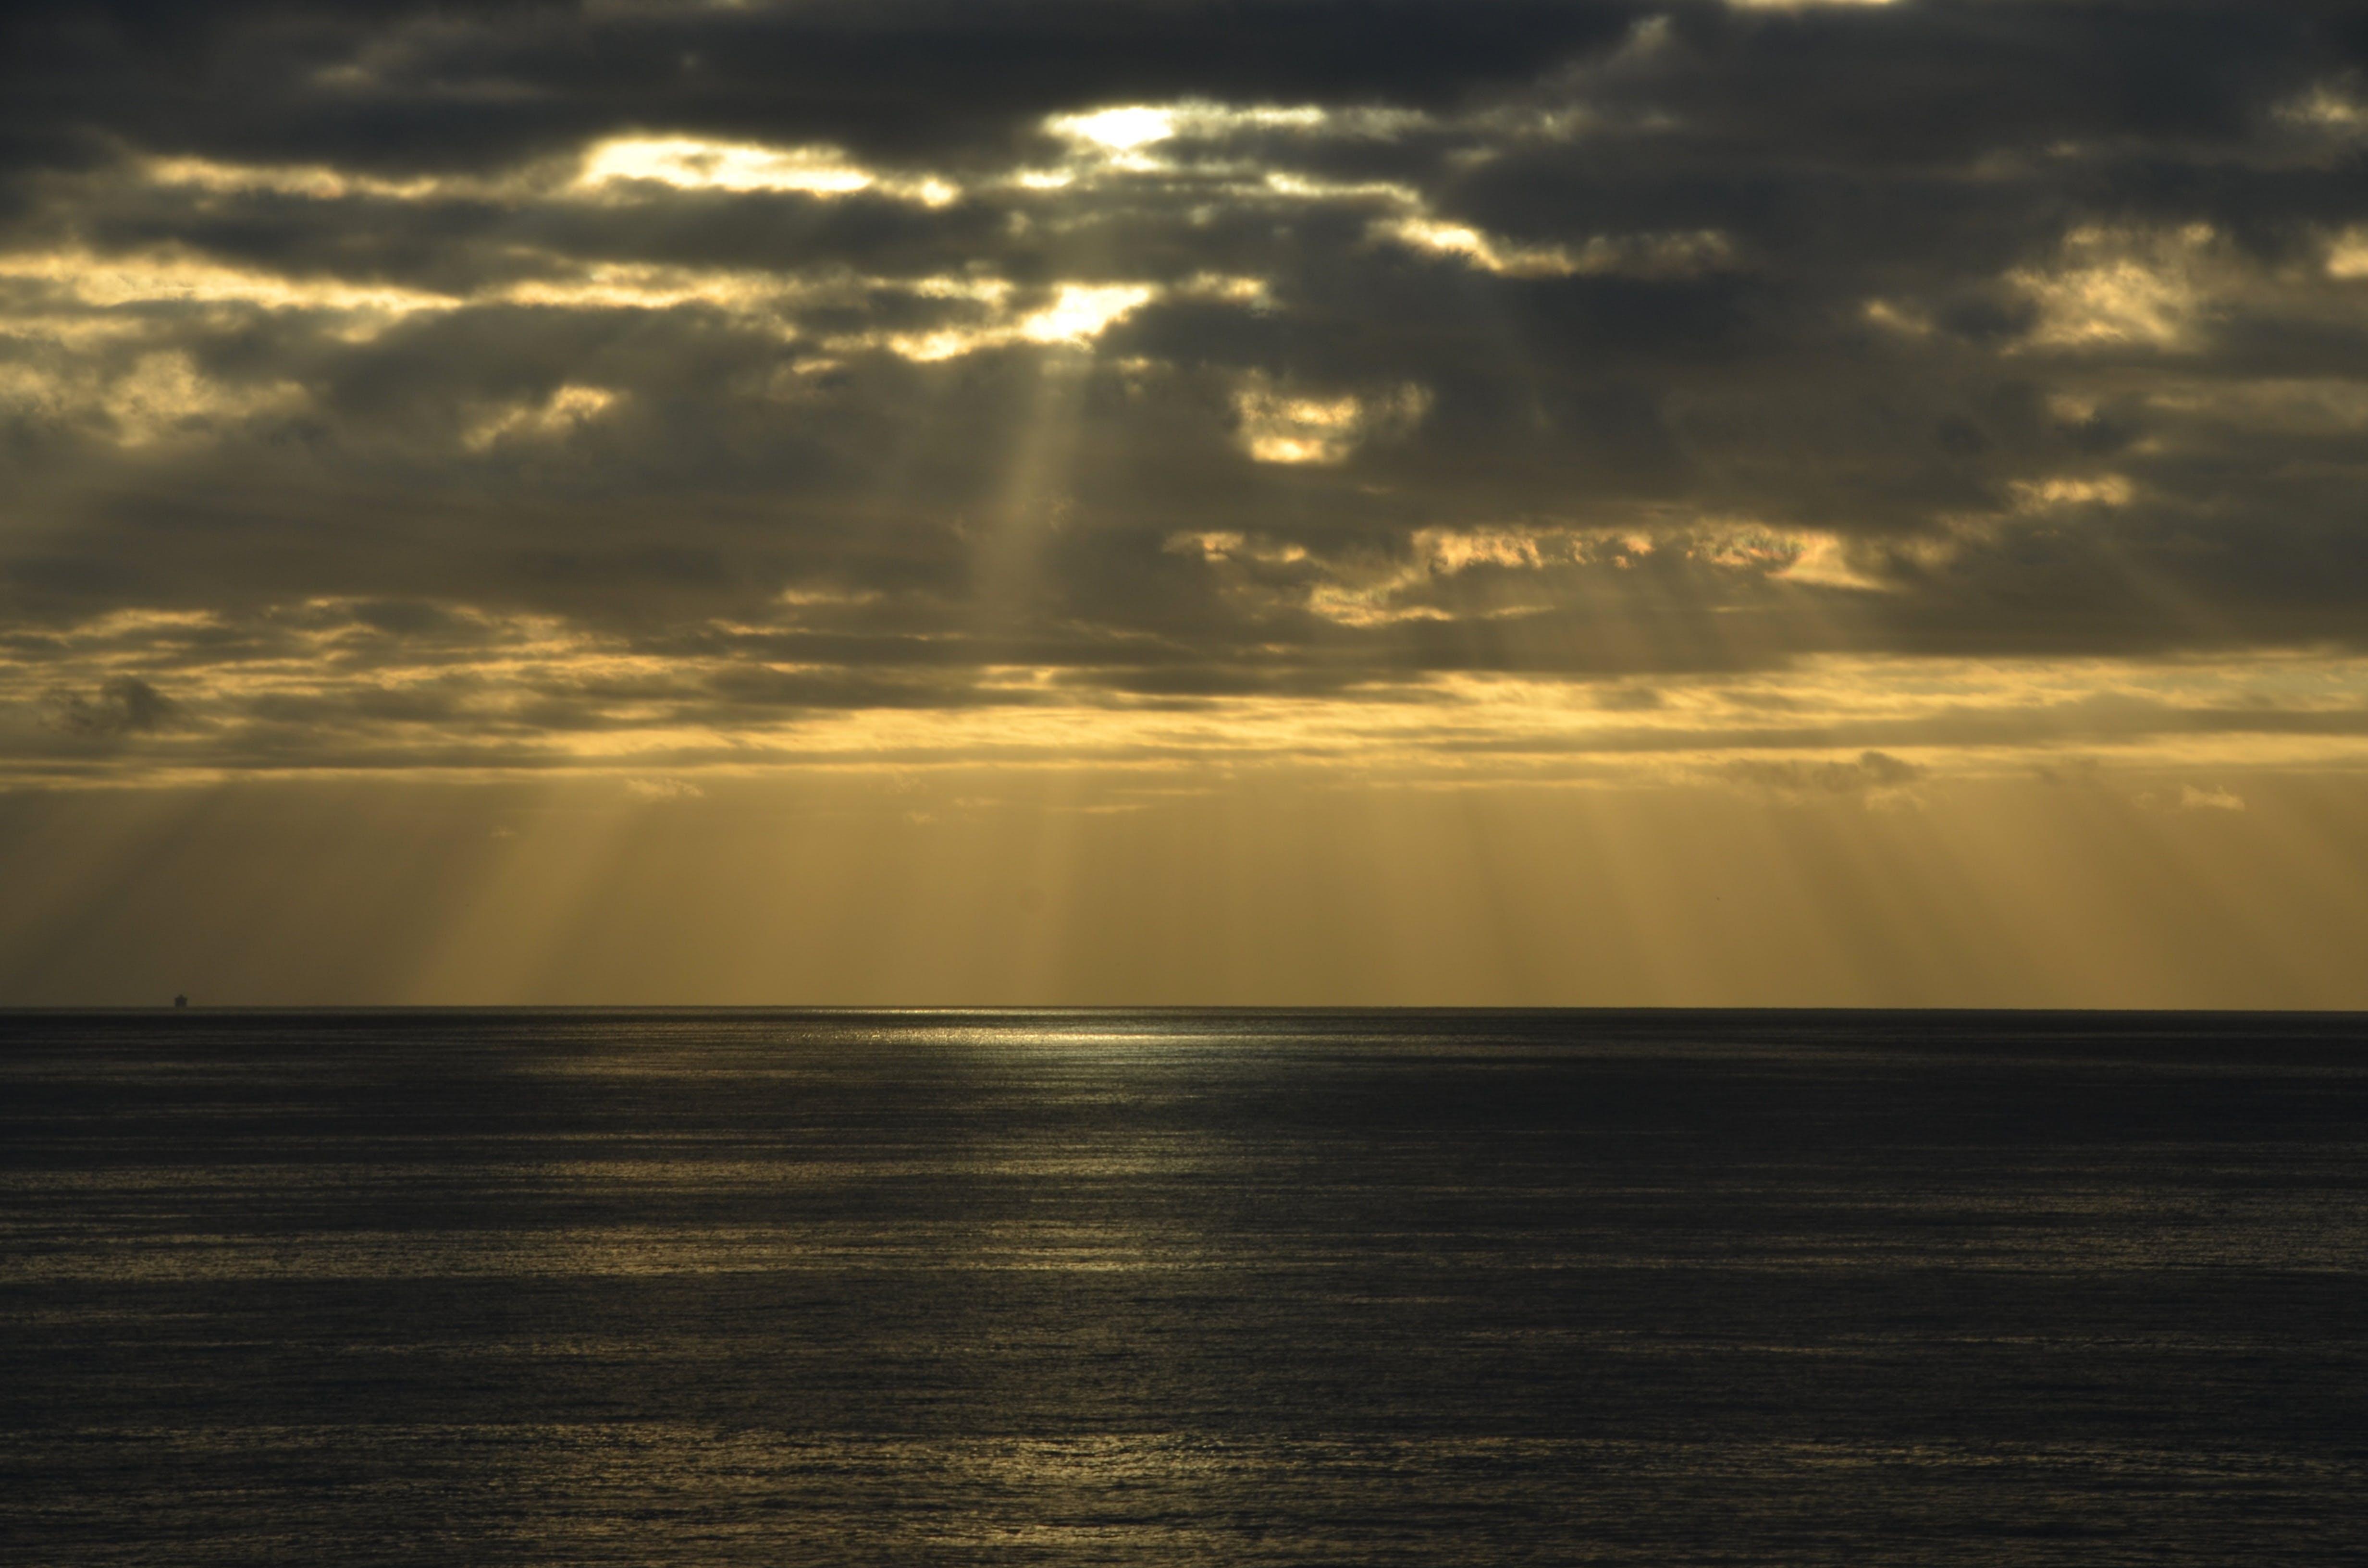 Free stock photo of sea, nature, sunset, romantic